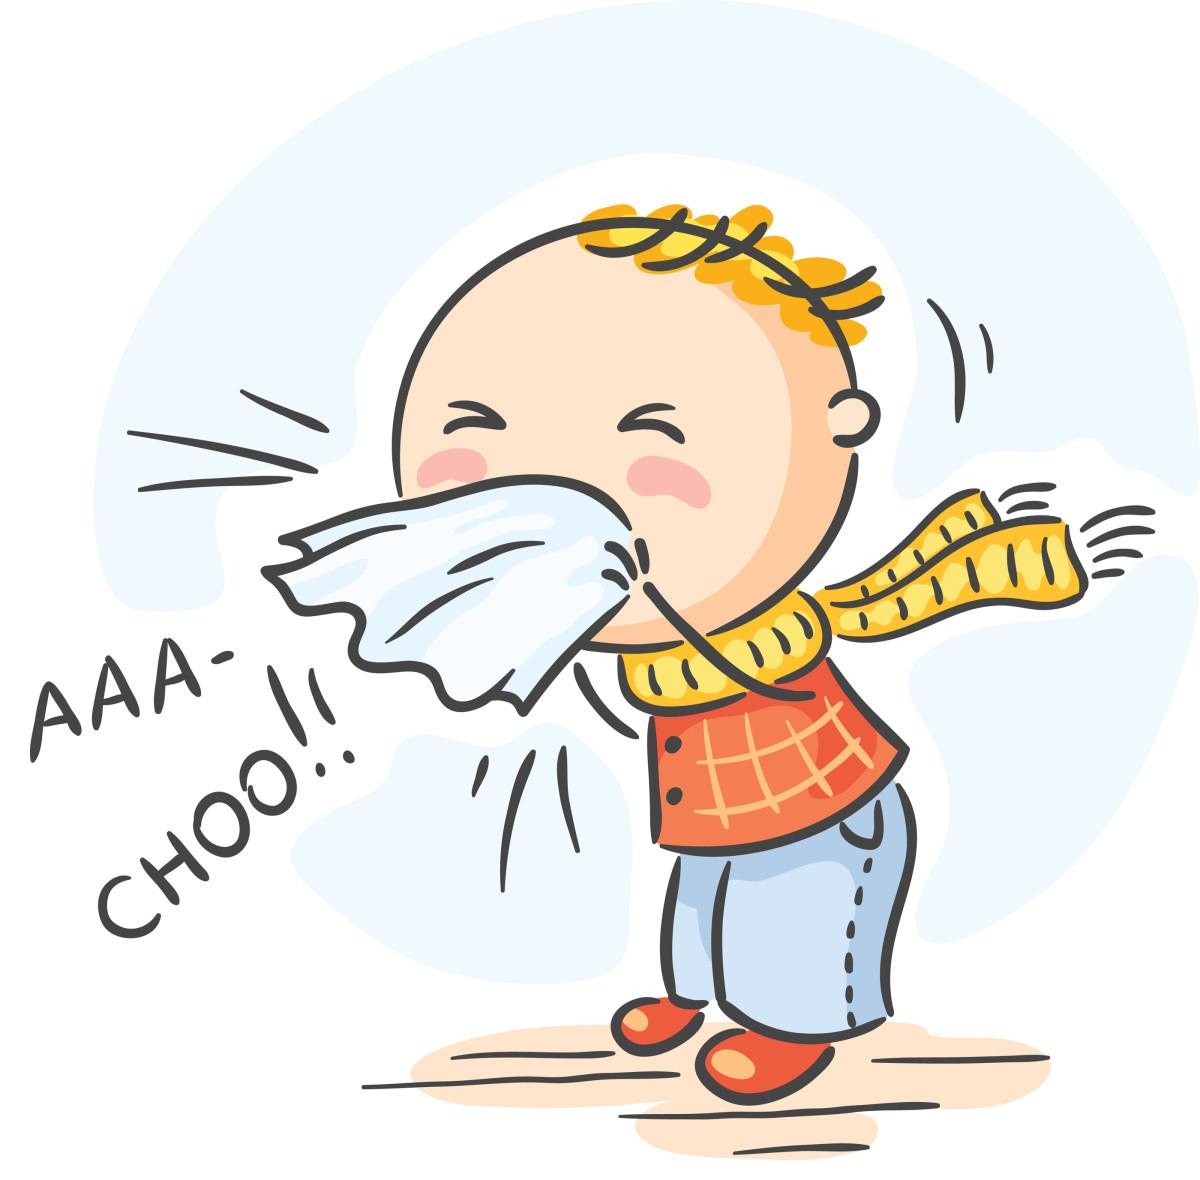 When It's Cold and Flu Season